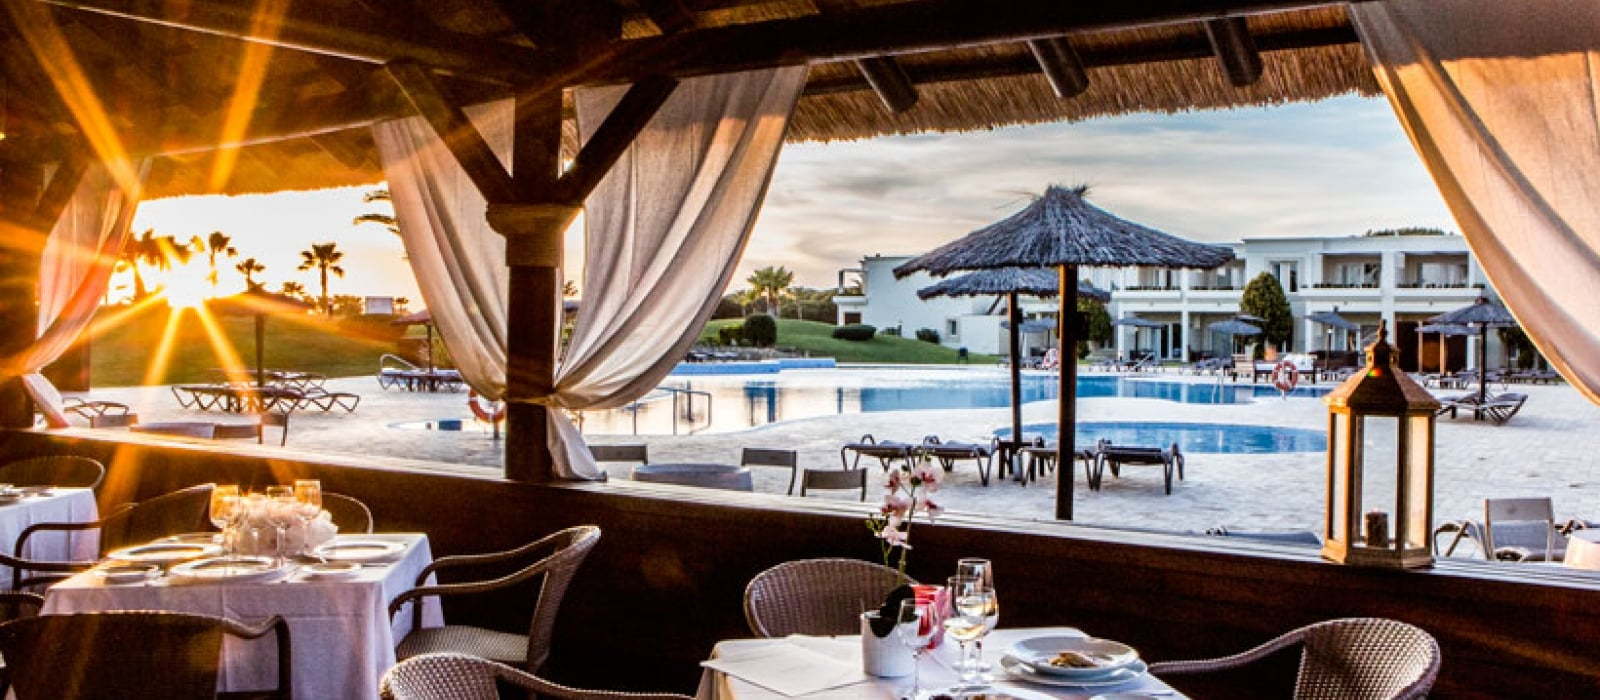 Hoteles Vincci. Hotel Vincci Costa Golf in Cadiz mit Restaurant El Chozo